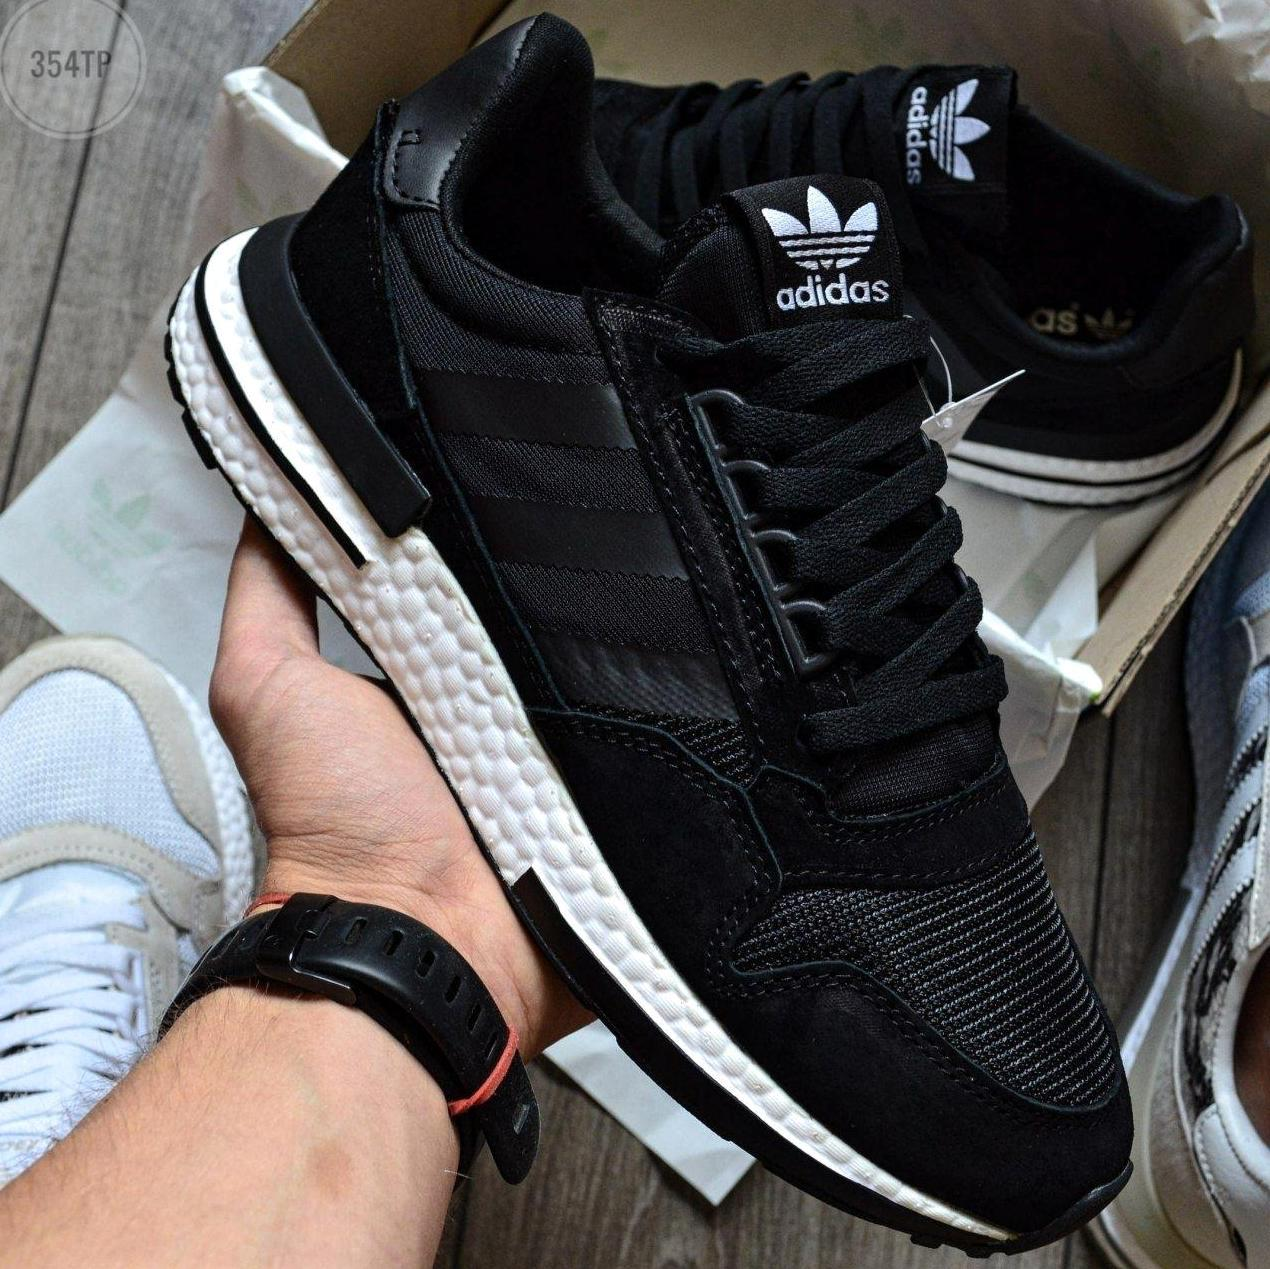 Мужские кроссовки Adidas ZX 500 RM Black/White, адидас зх 500